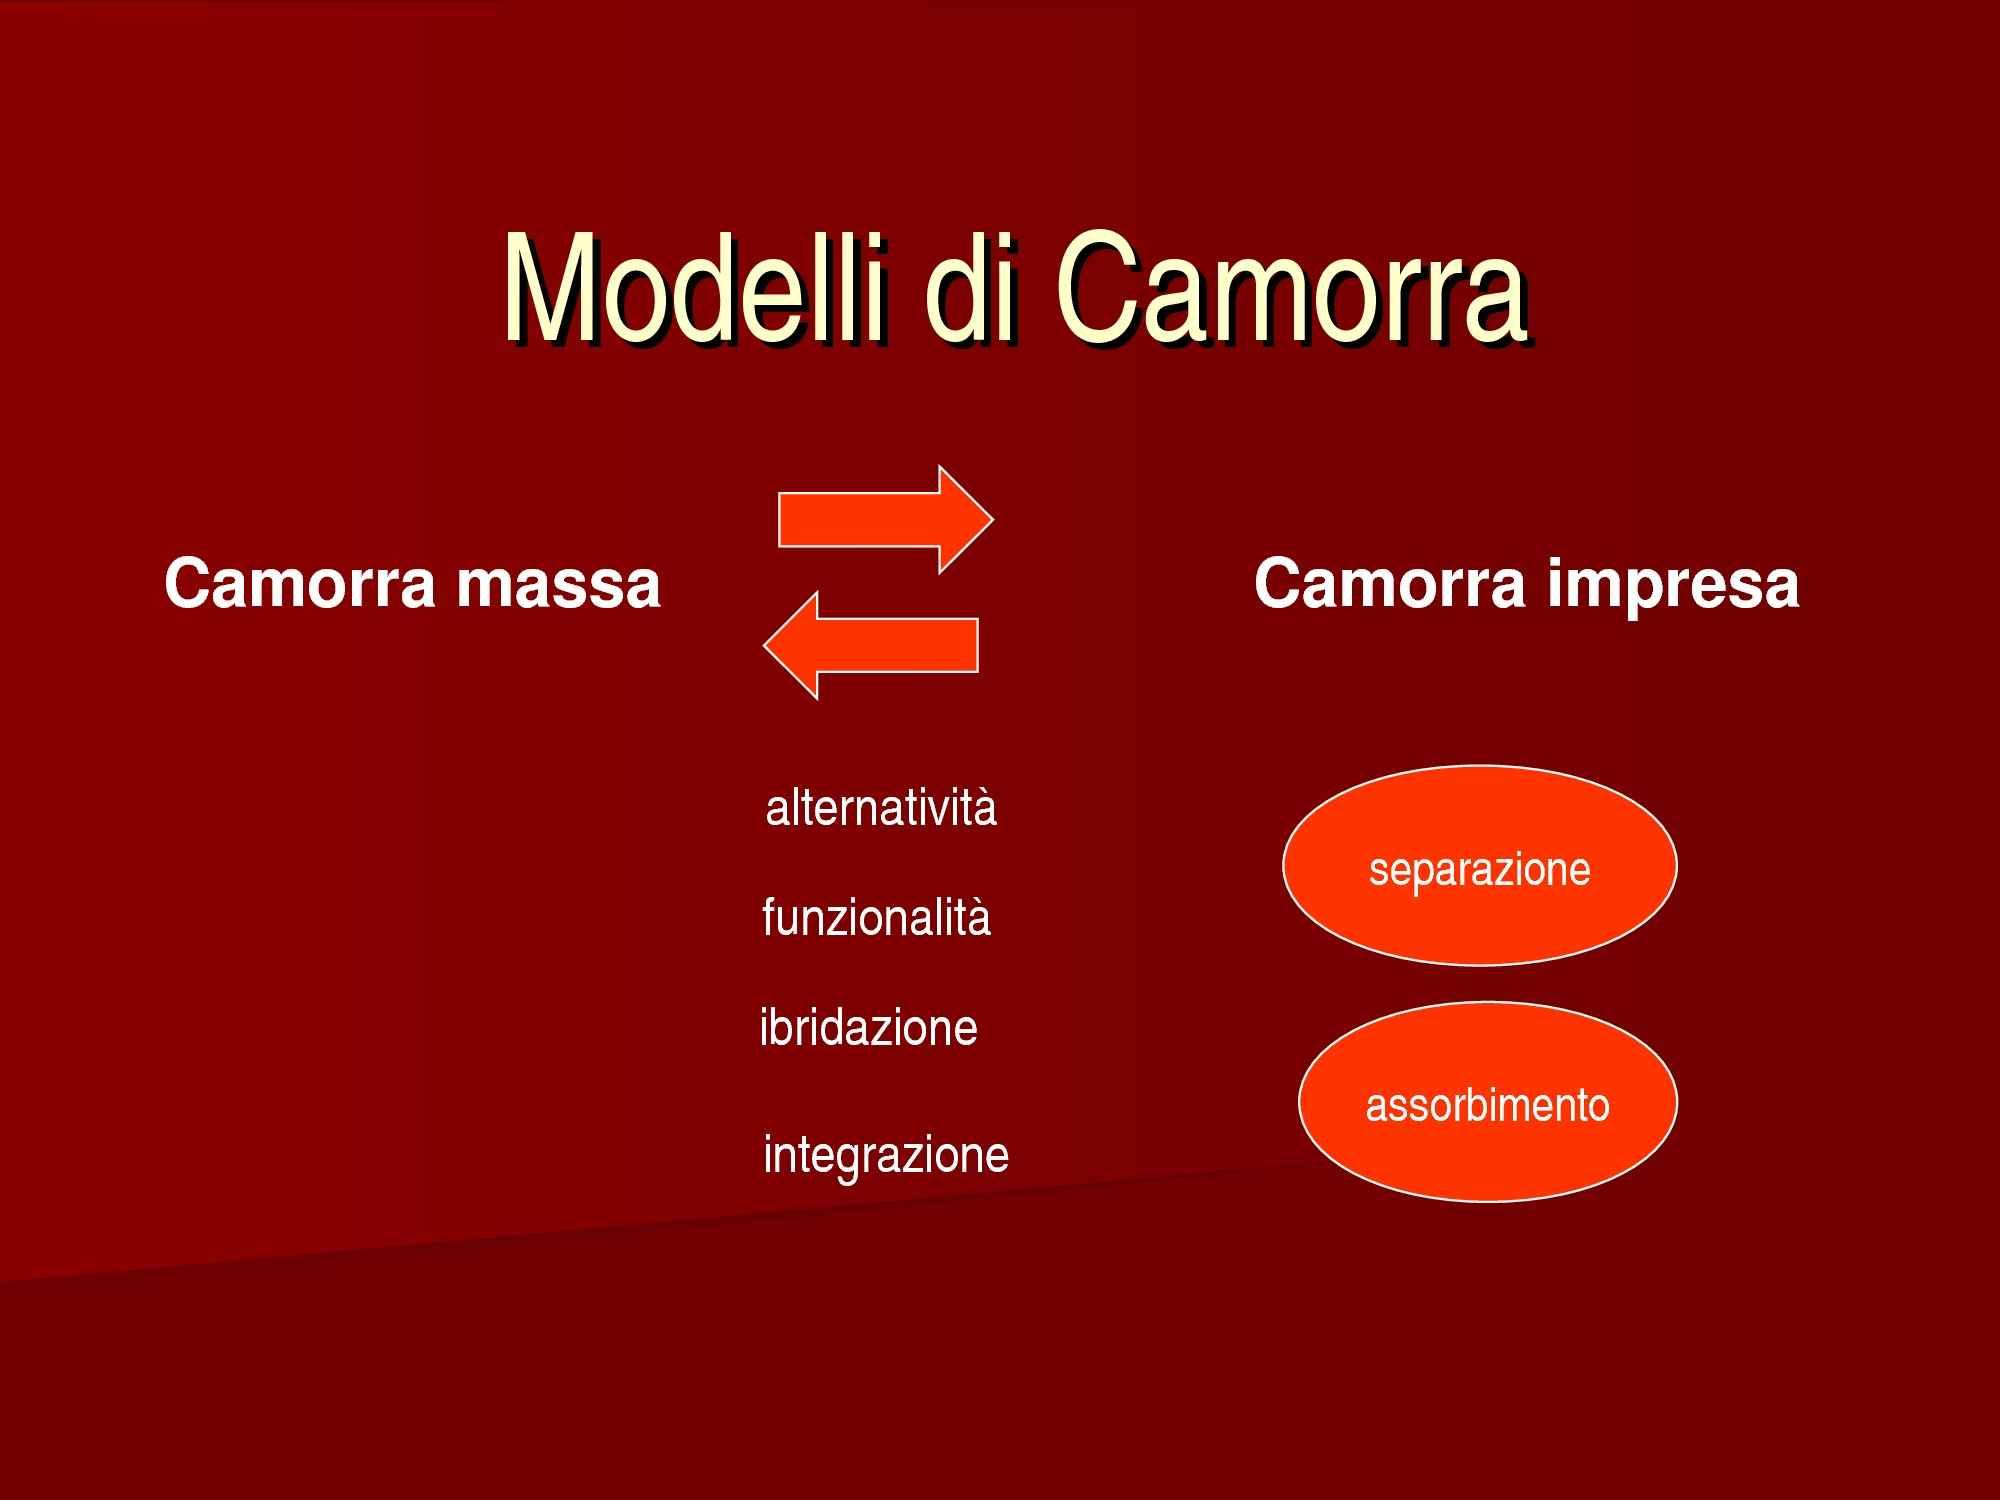 Camorra - Modelli